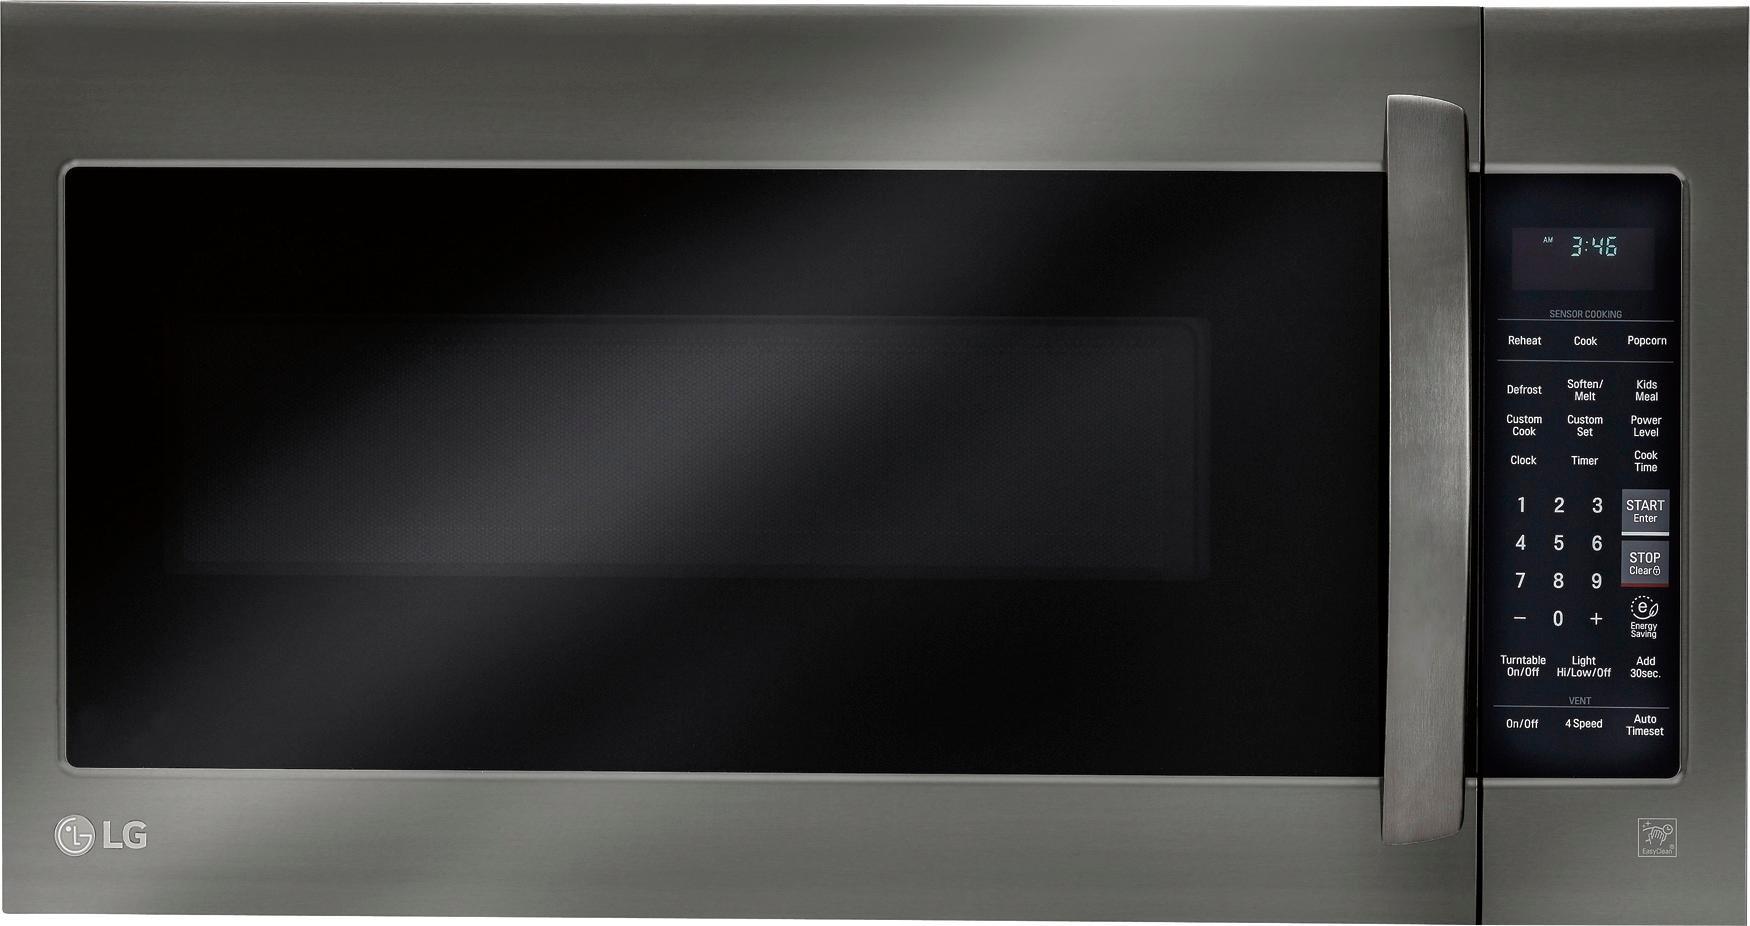 lg 2 0 cu ft over the range microwave with sensor cooking printproof black stainless steel